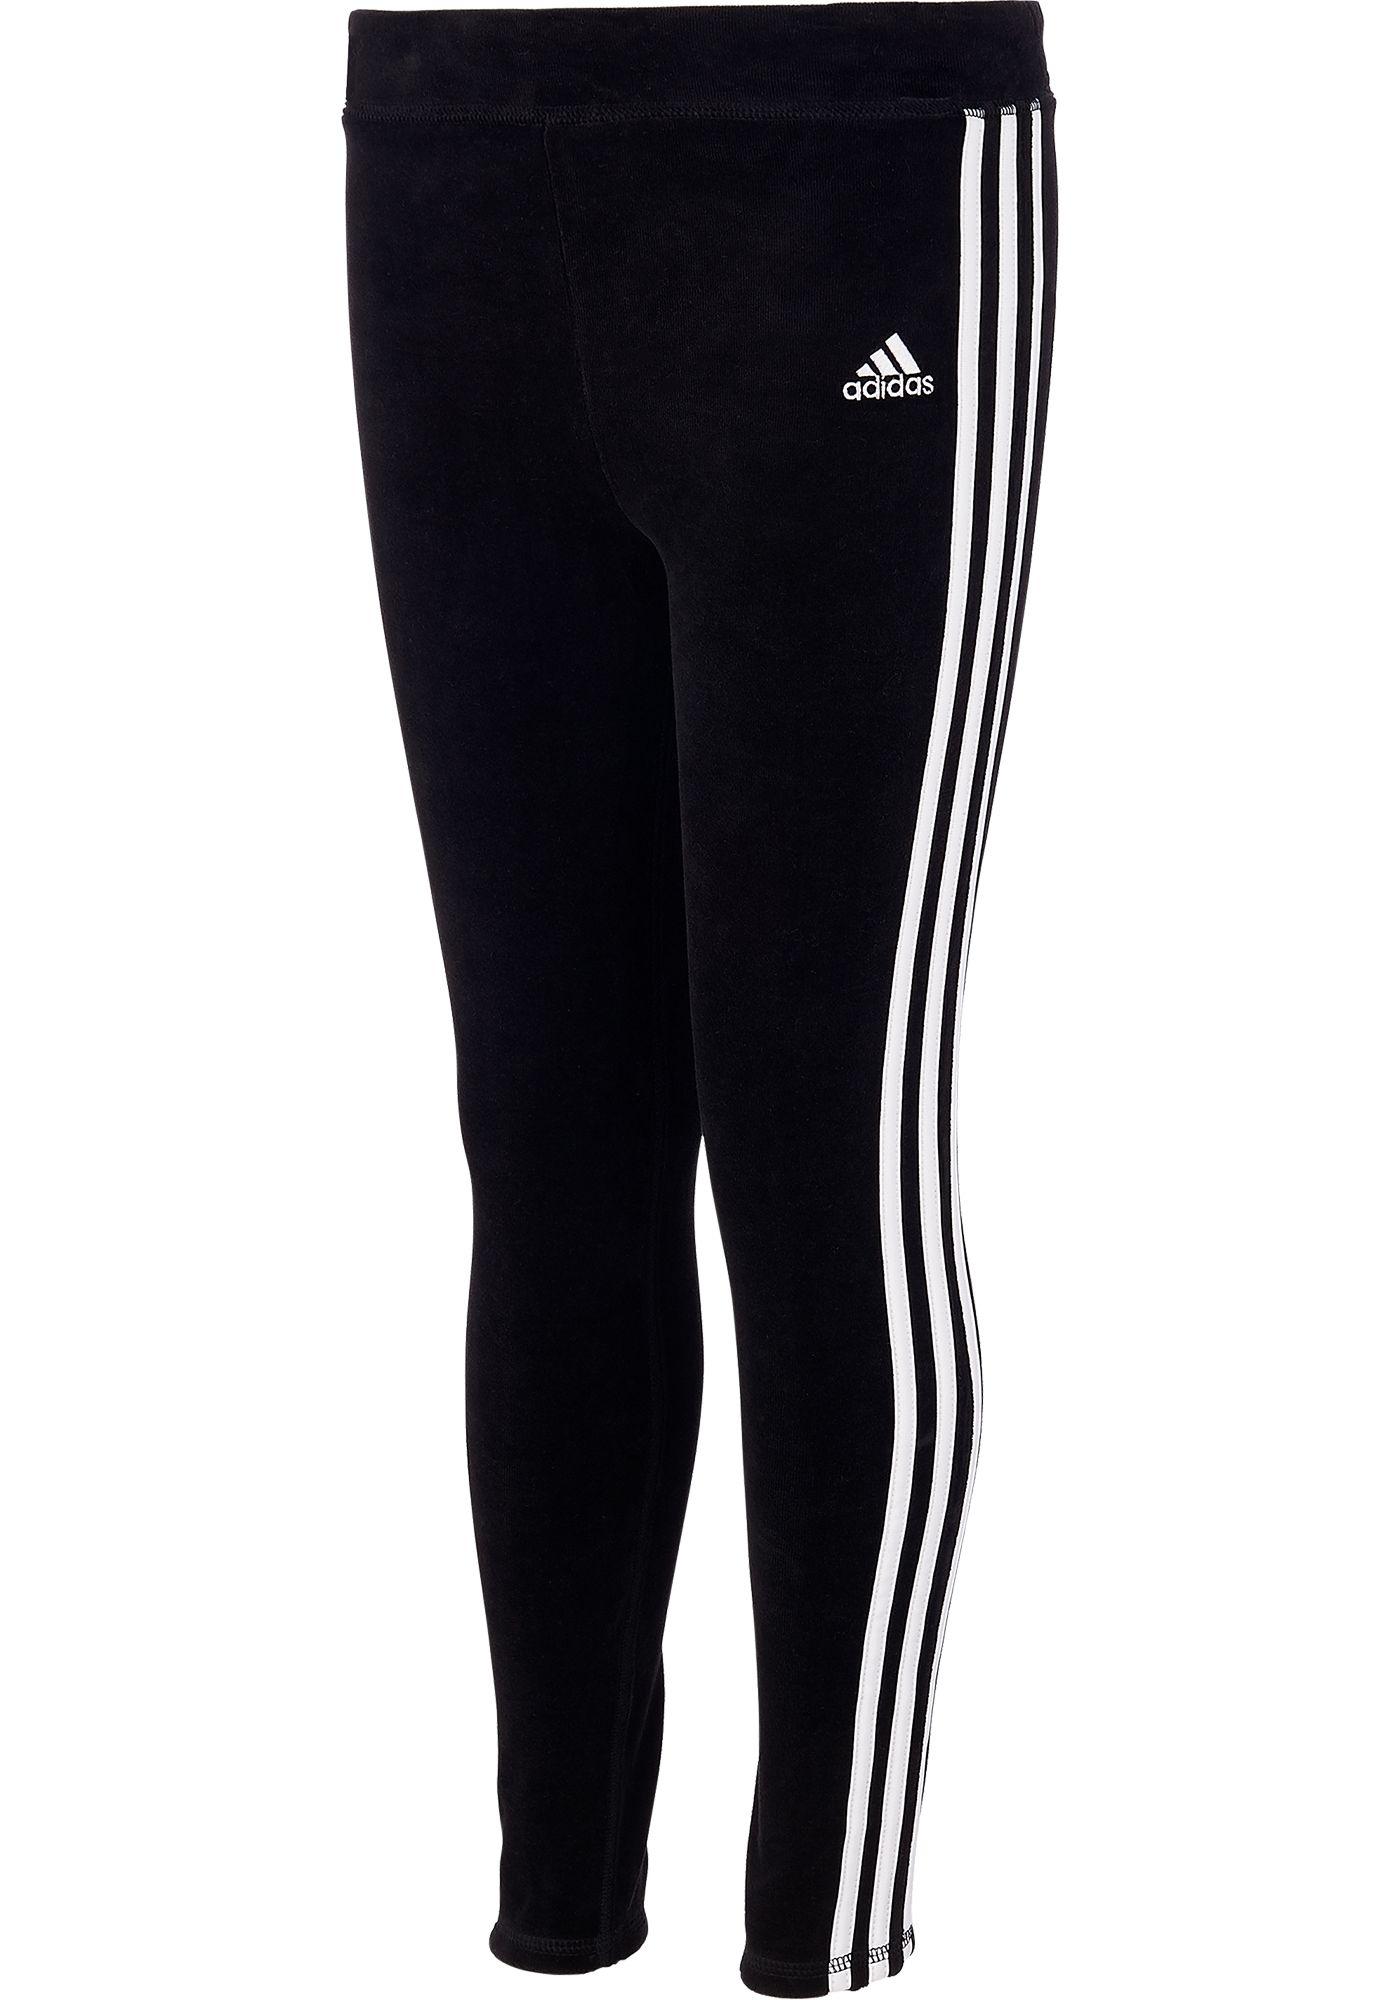 adidas Girls' Velour Stripe Tights